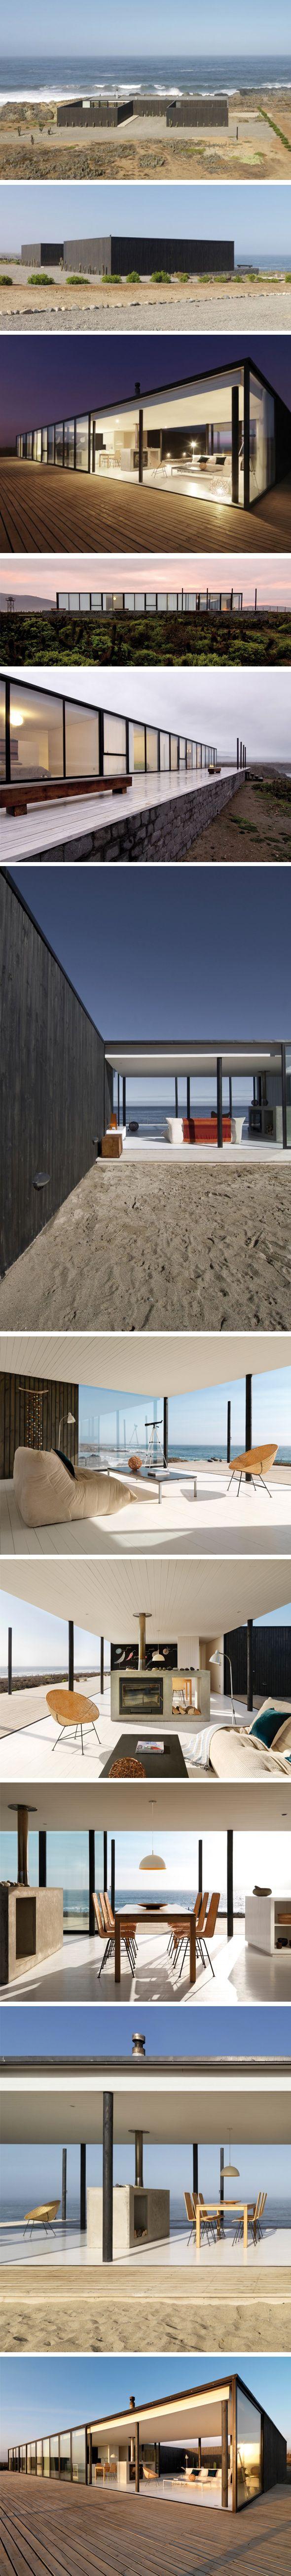 Casa W by 01ARQ, Chile ,nice design hmmmm new house somewhere warm !!